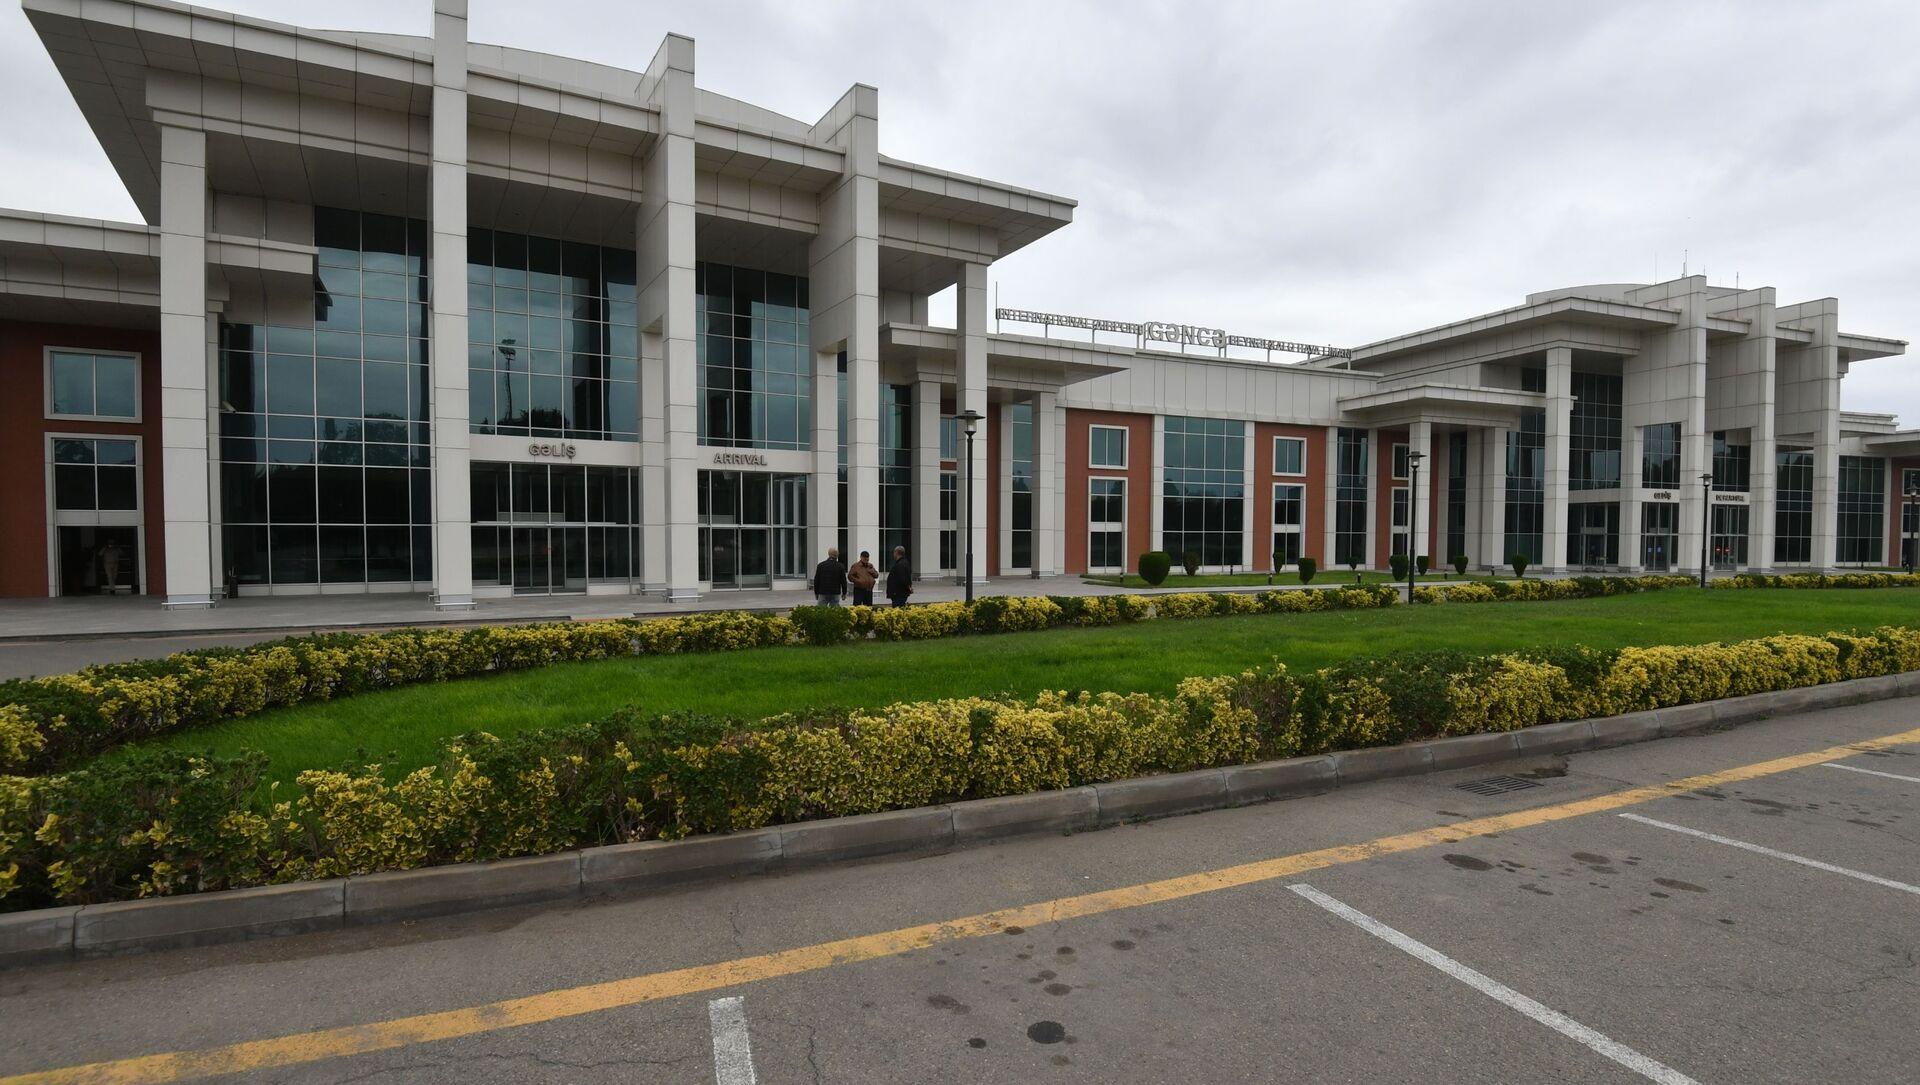 Здание аэропорта города Гянджа - Sputnik Азербайджан, 1920, 12.08.2021